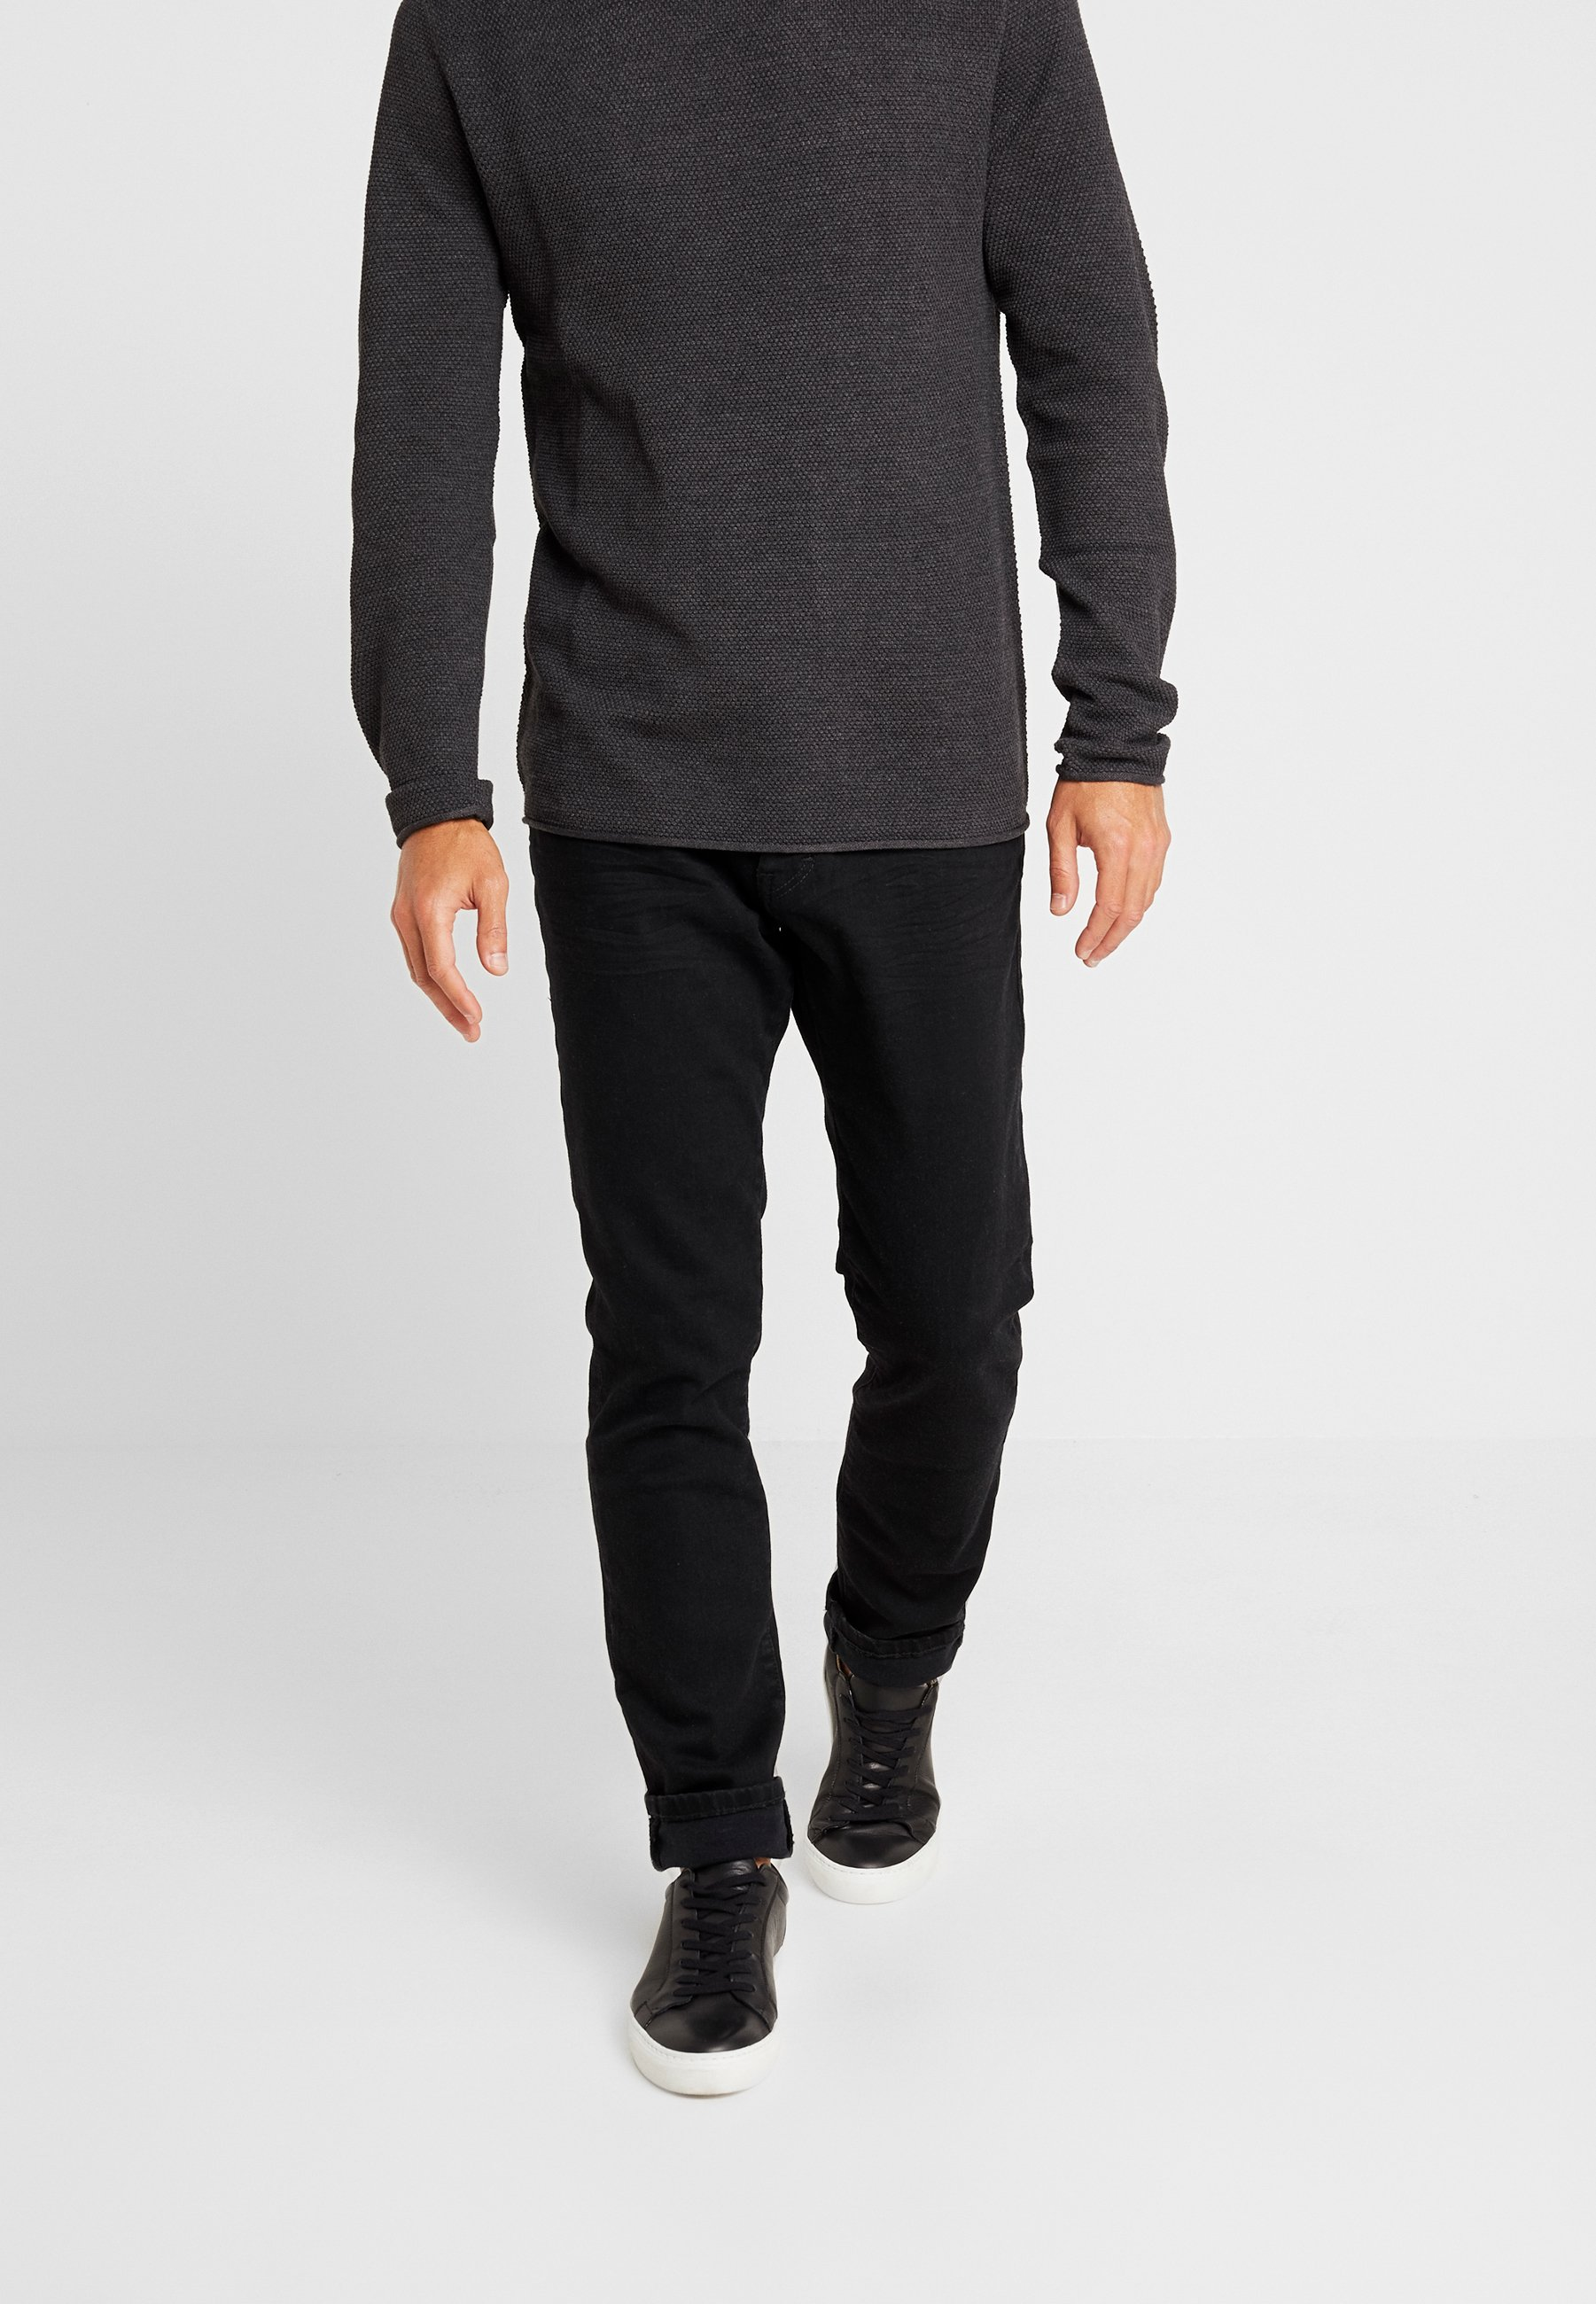 Black Tailor Clean Slim Tom JoshJean Raw Denim ED29IH